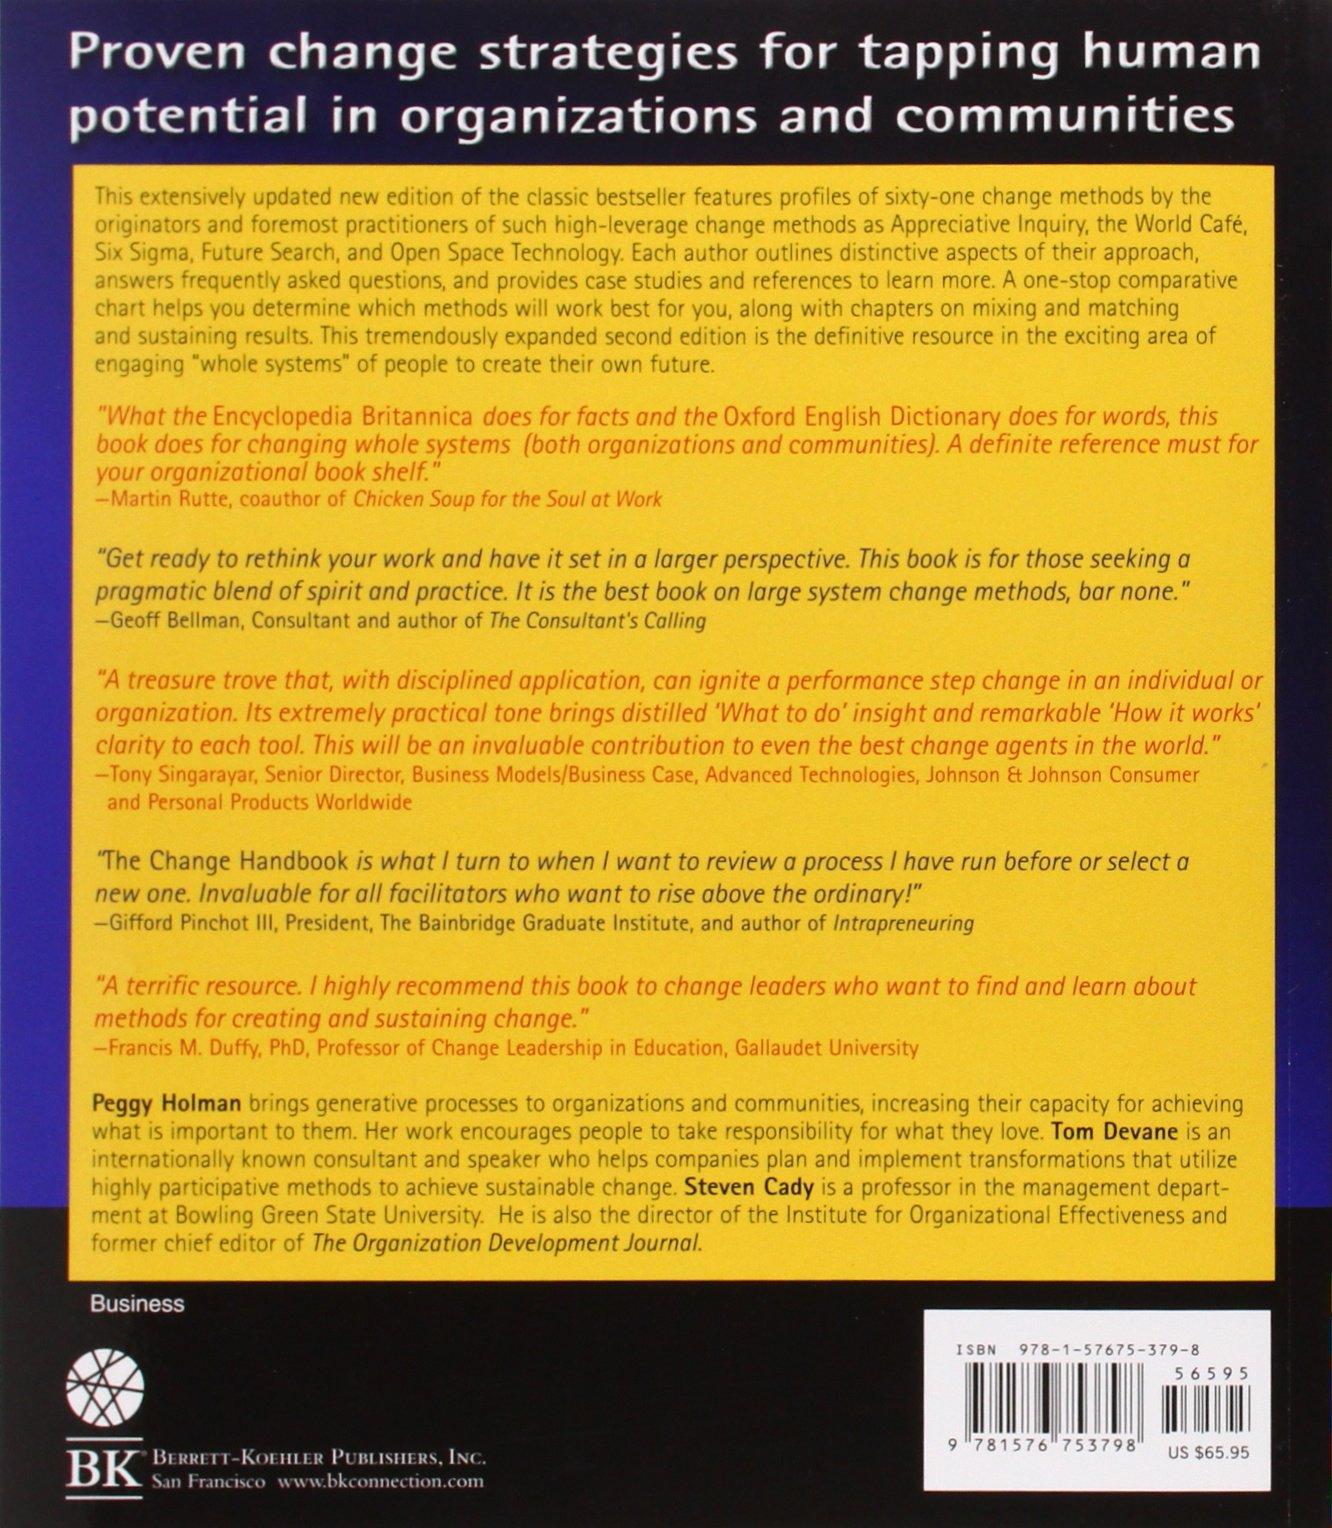 The Change Handbook The Definitive Resource on Today s Best Methods